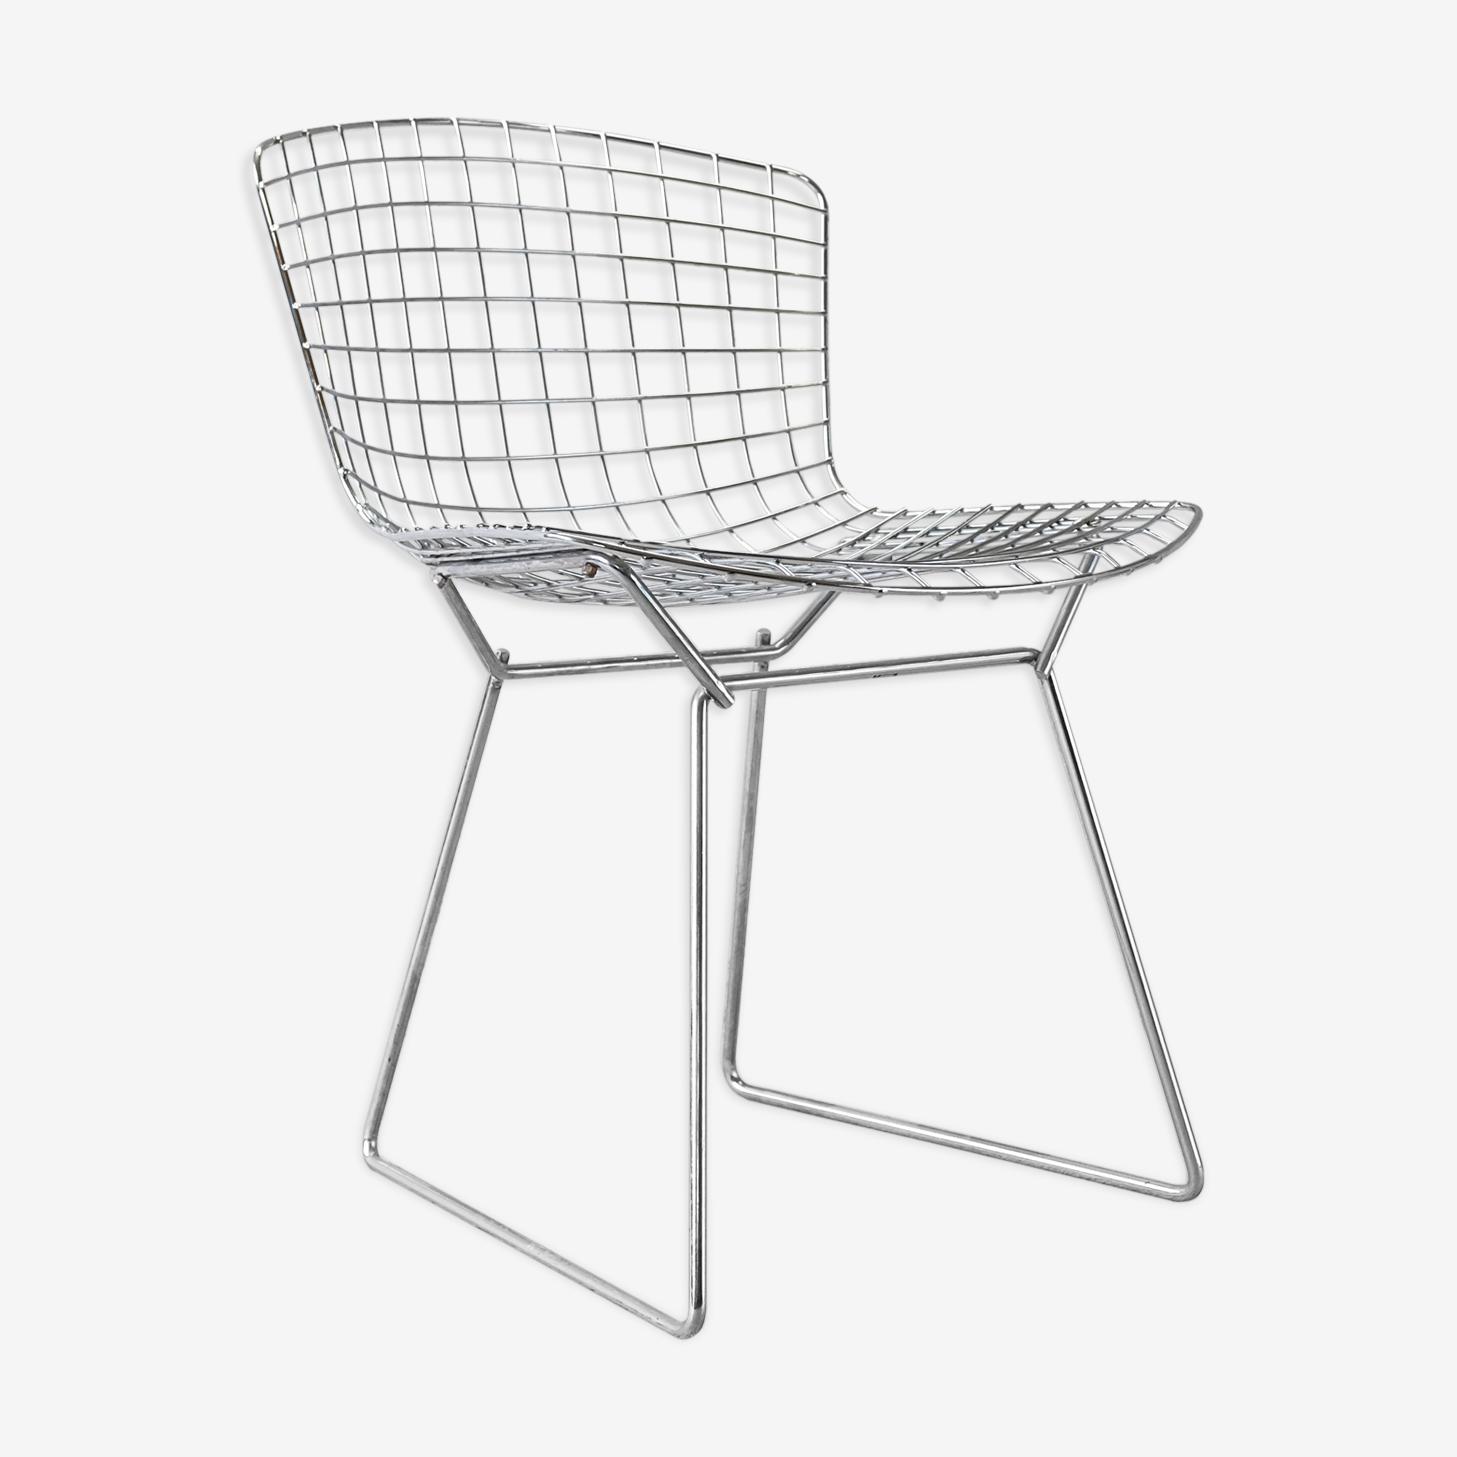 "Chair Harry Bertoia ""Side chair"" edition Knoll 1970"